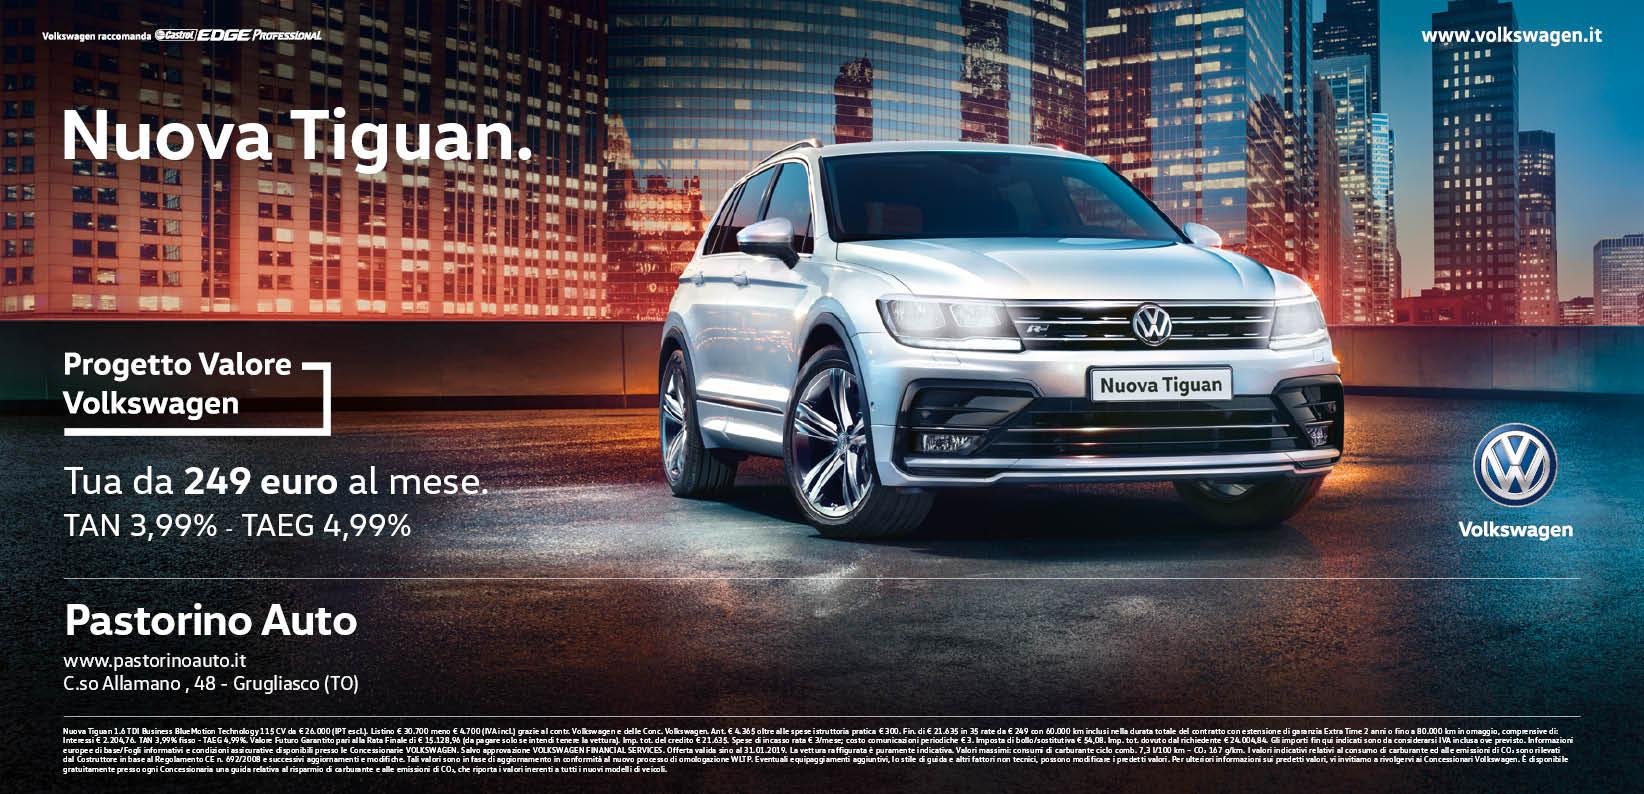 Pastorino Concessionaria Volkswagen Torino